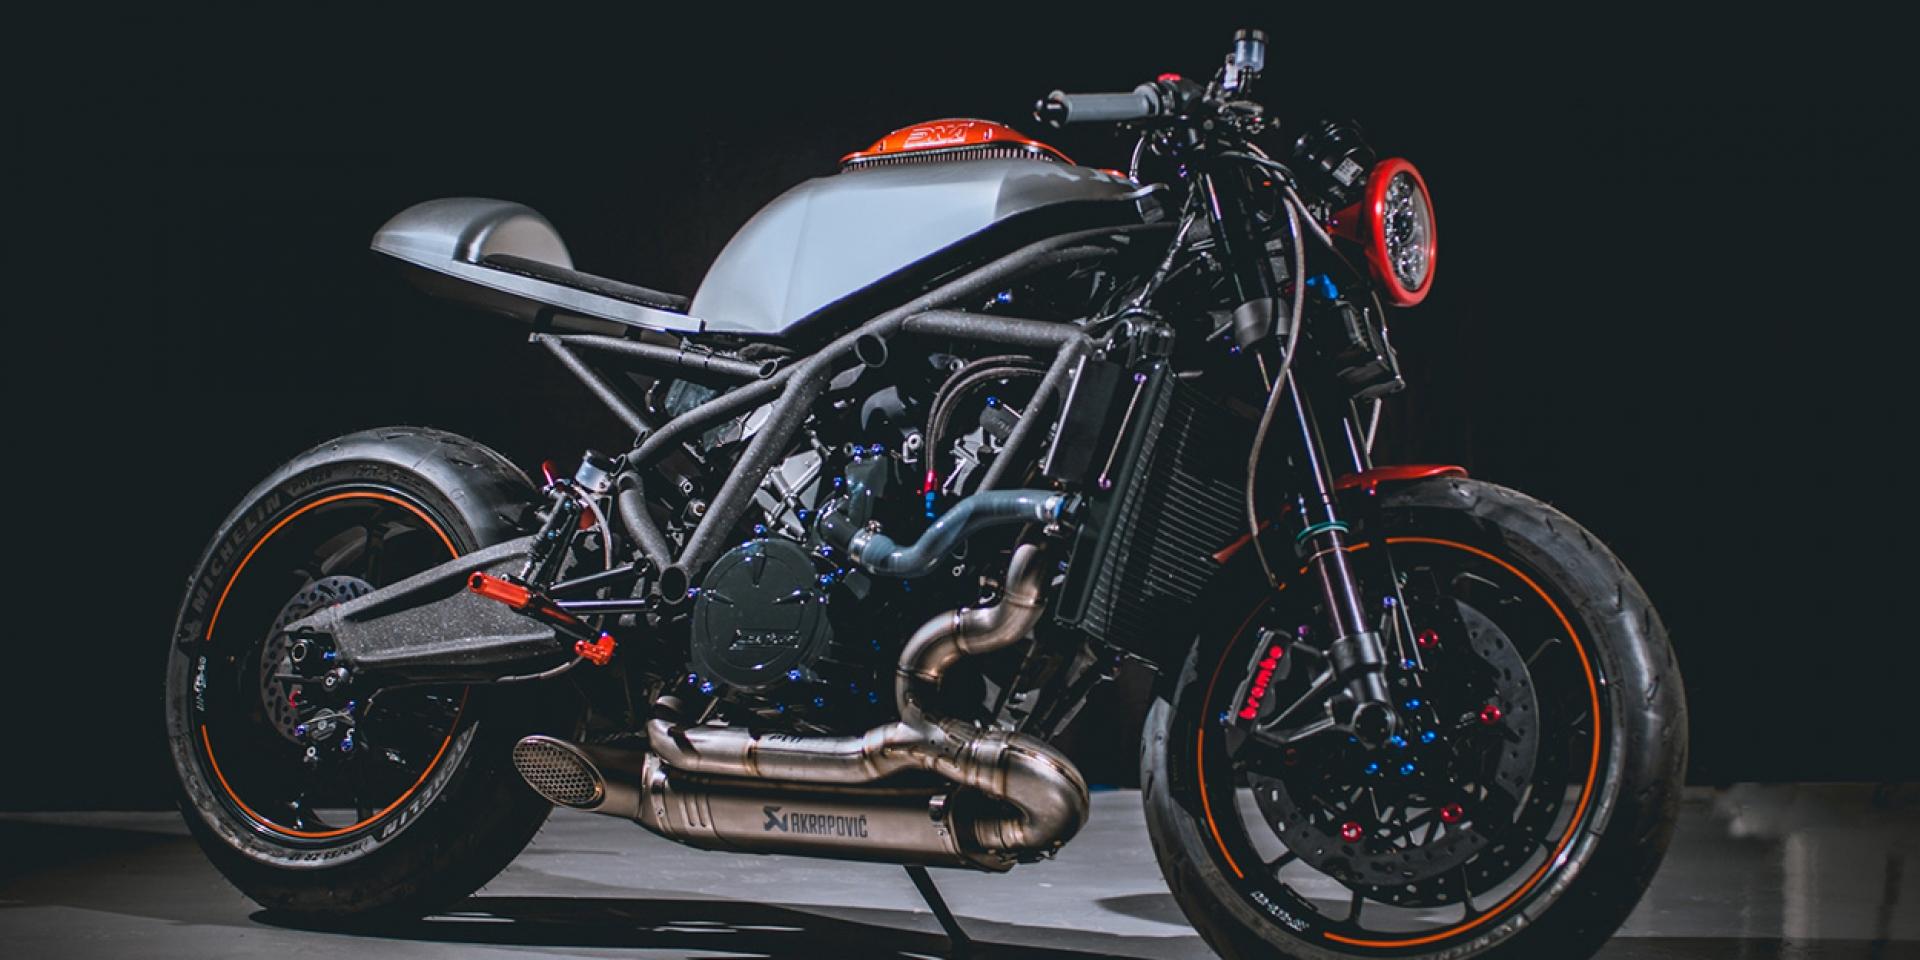 KTM也咖啡?沒看過了吧!KTM RC8 Cafe Racer By Nikolaidis'